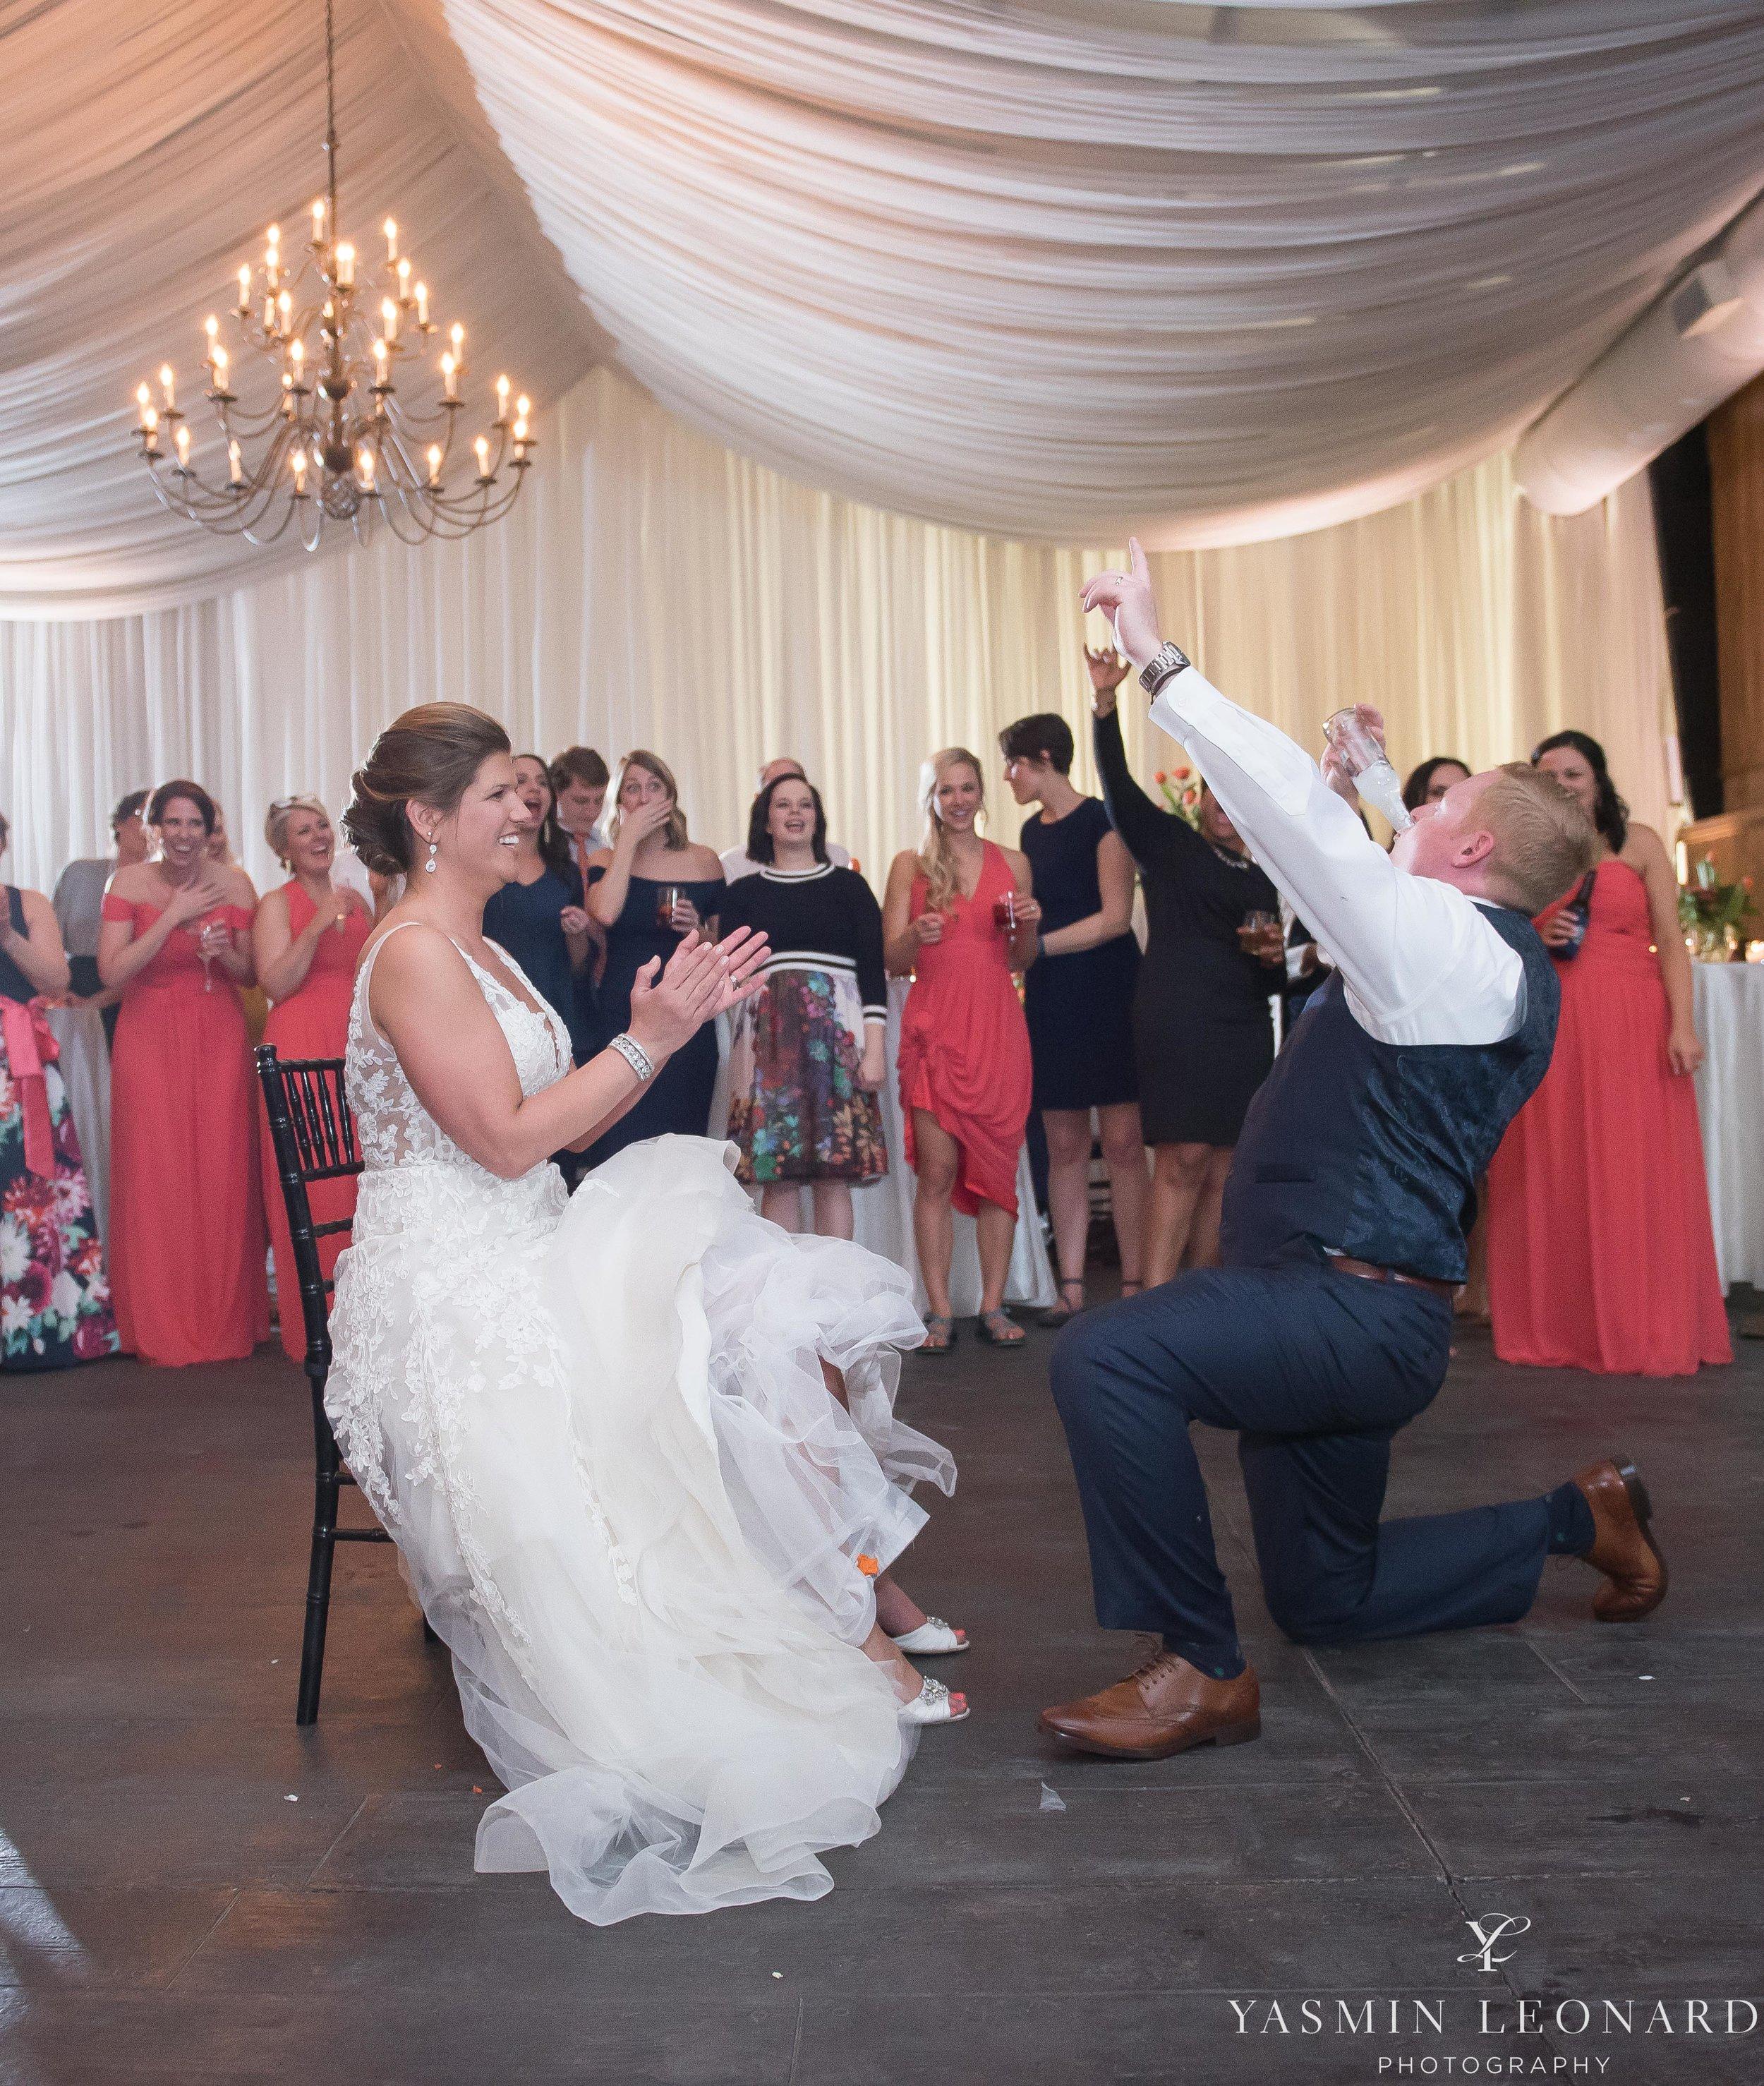 Adaumont Farm - Adaumont Farm Weddings - Trinity Weddings - NC Weddings - Yasmin Leonard Photography-97.jpg